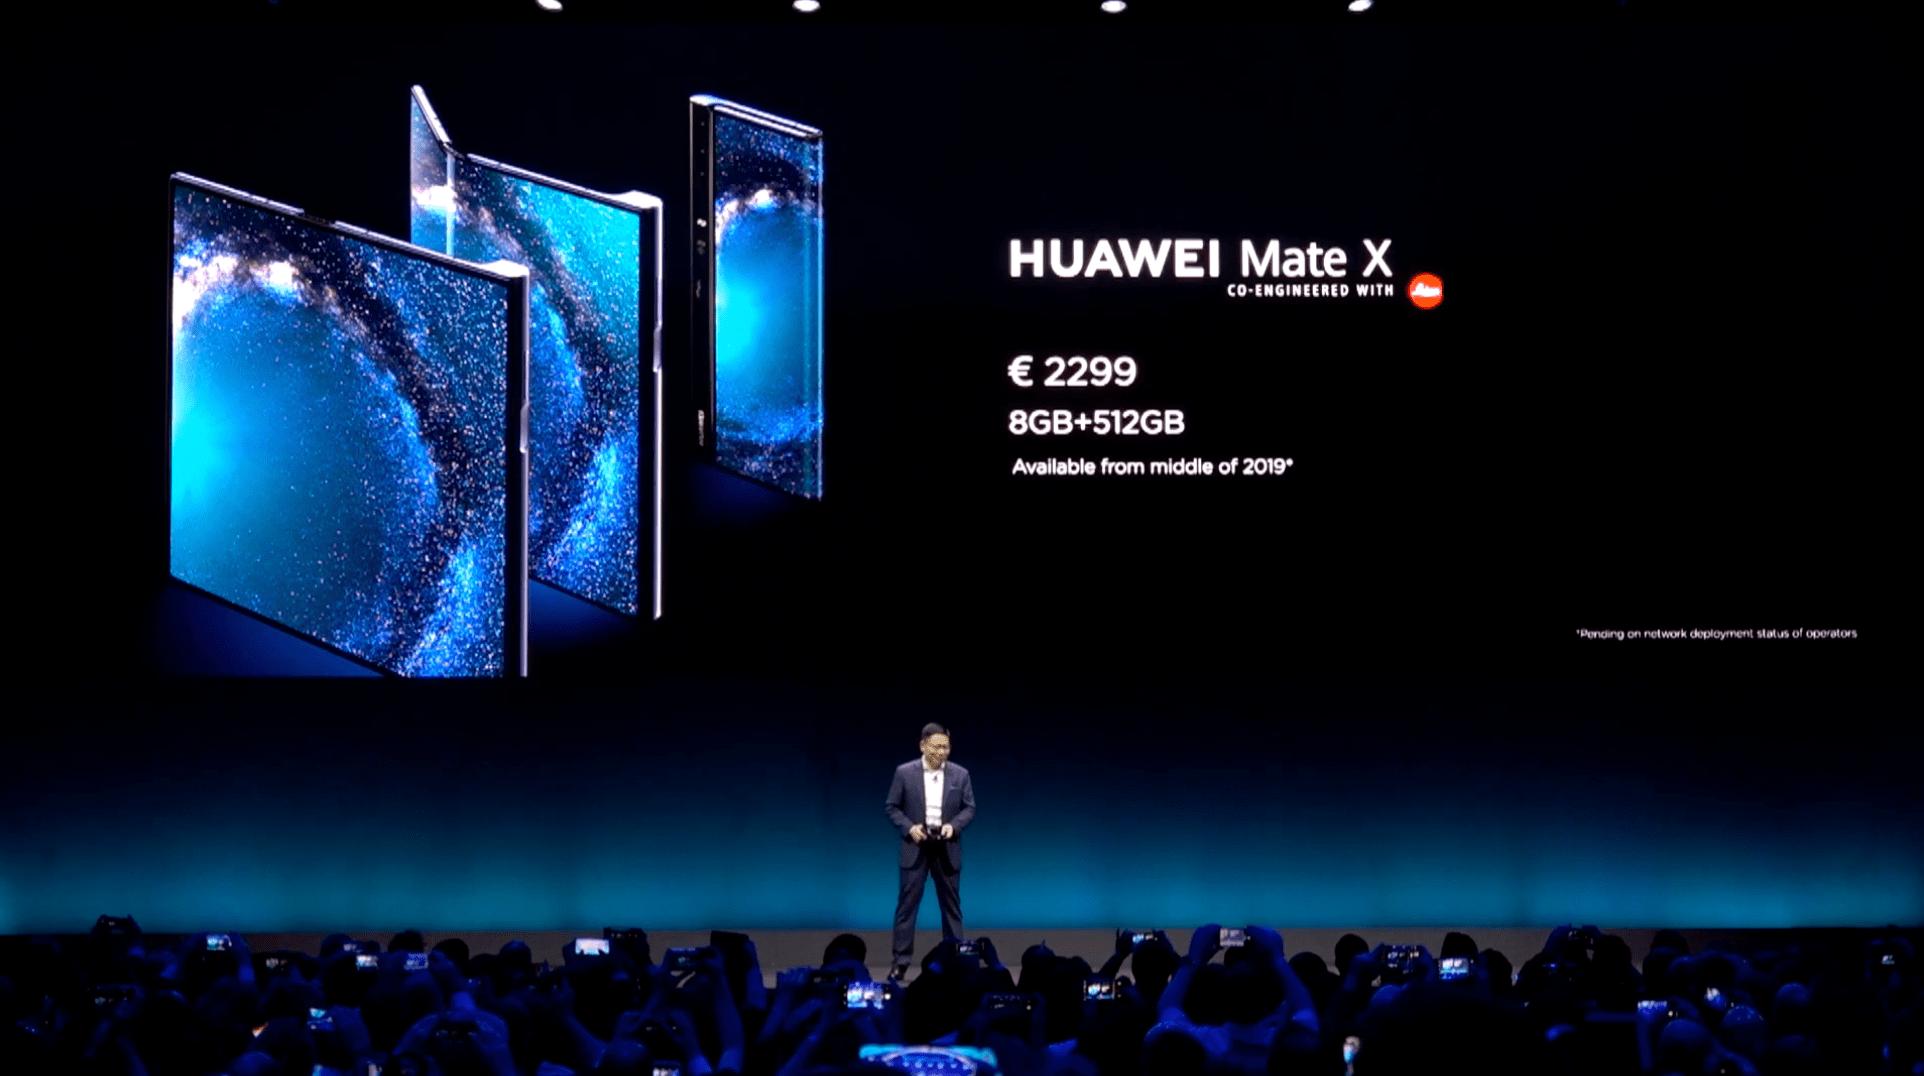 Huawei Mate X cena w euro